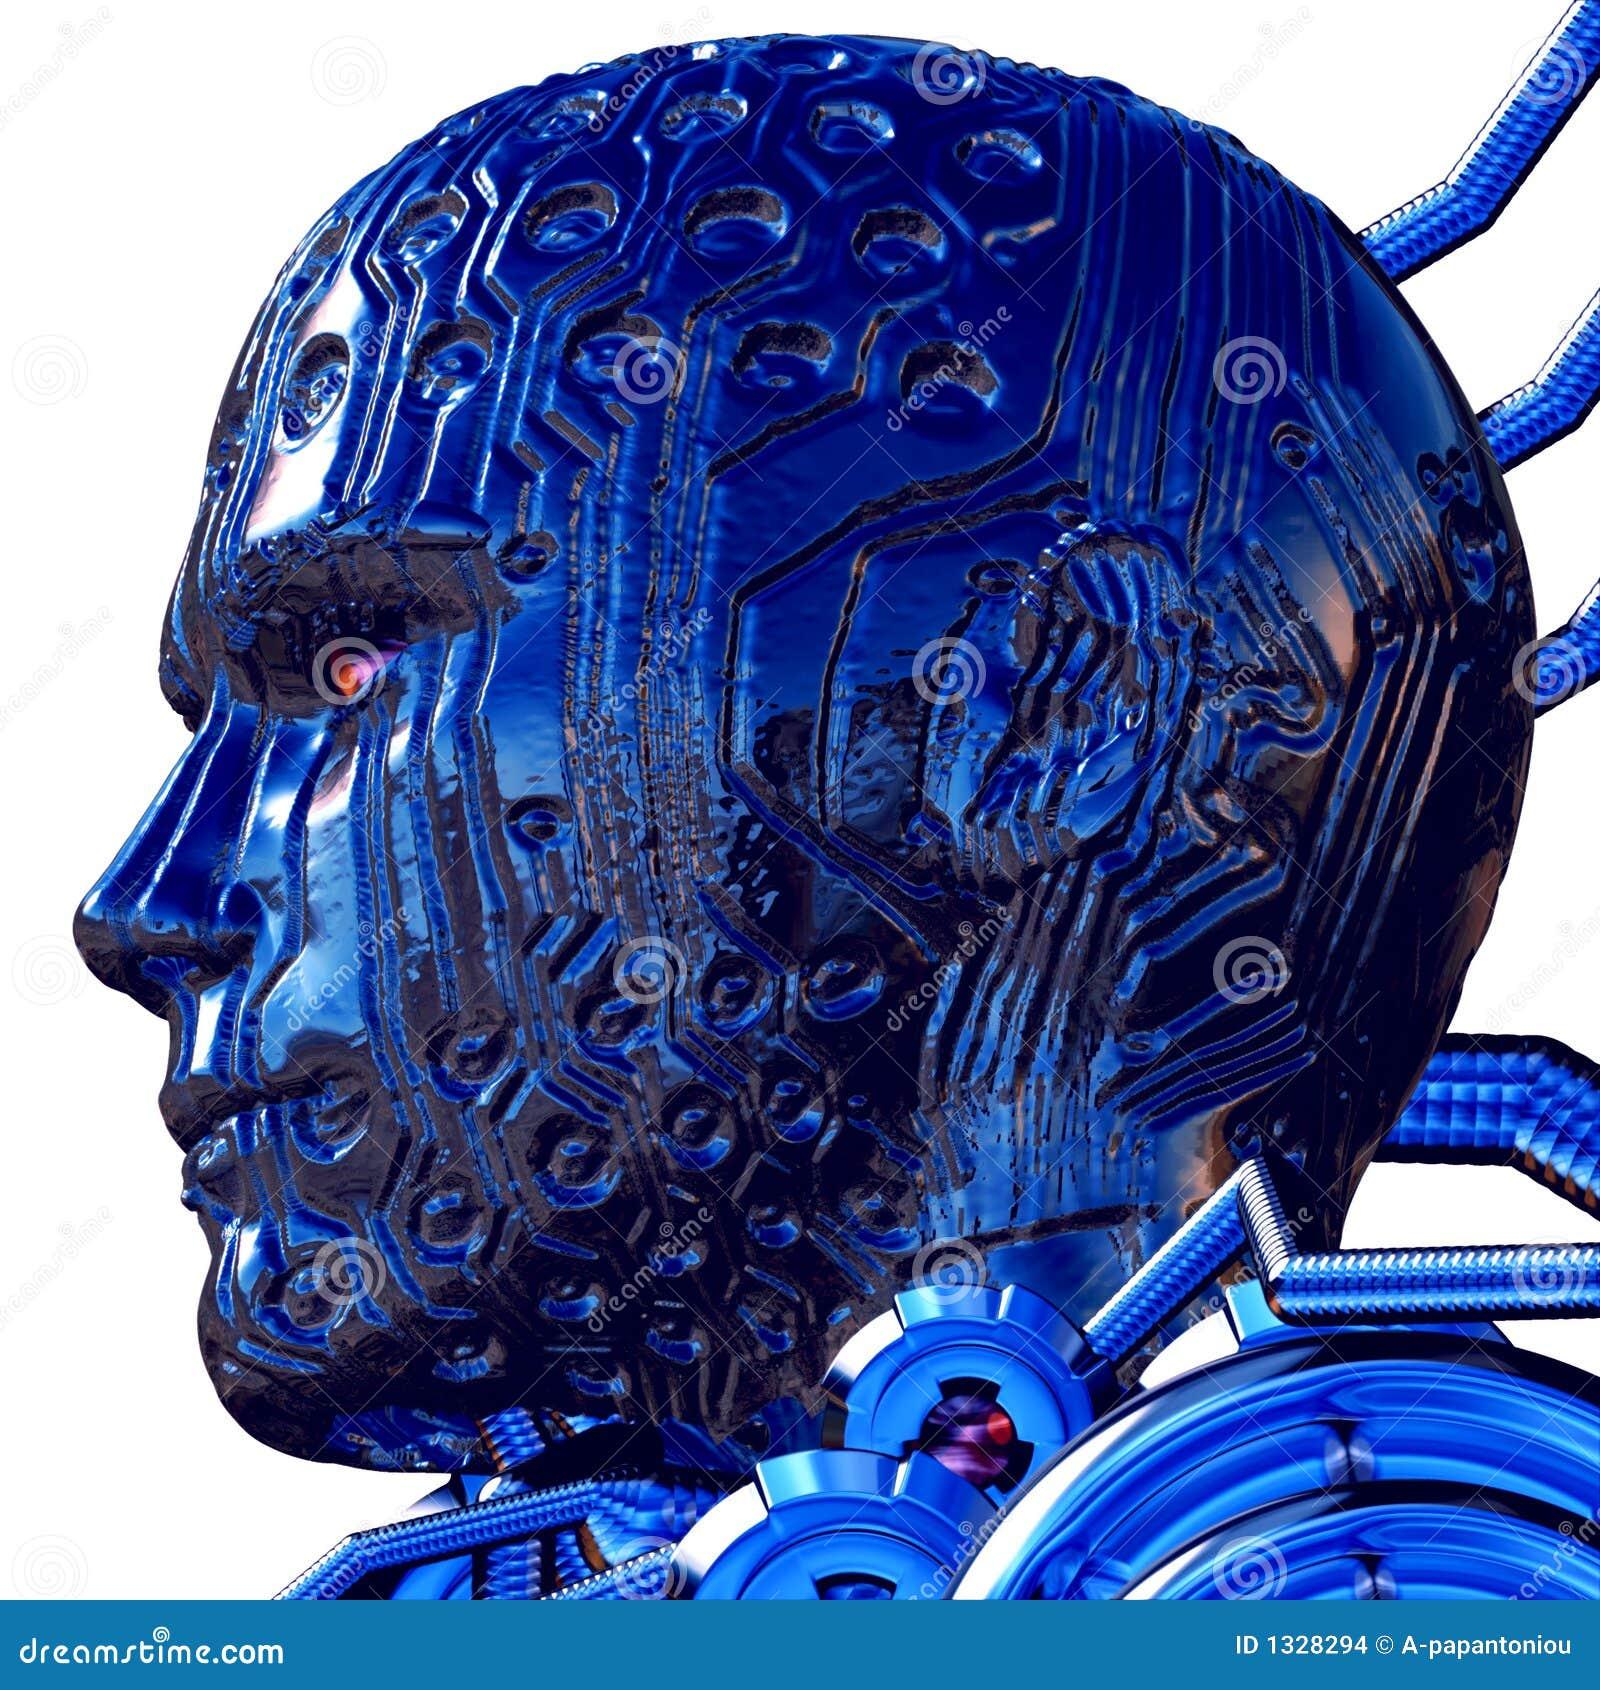 3D Digital Overlord